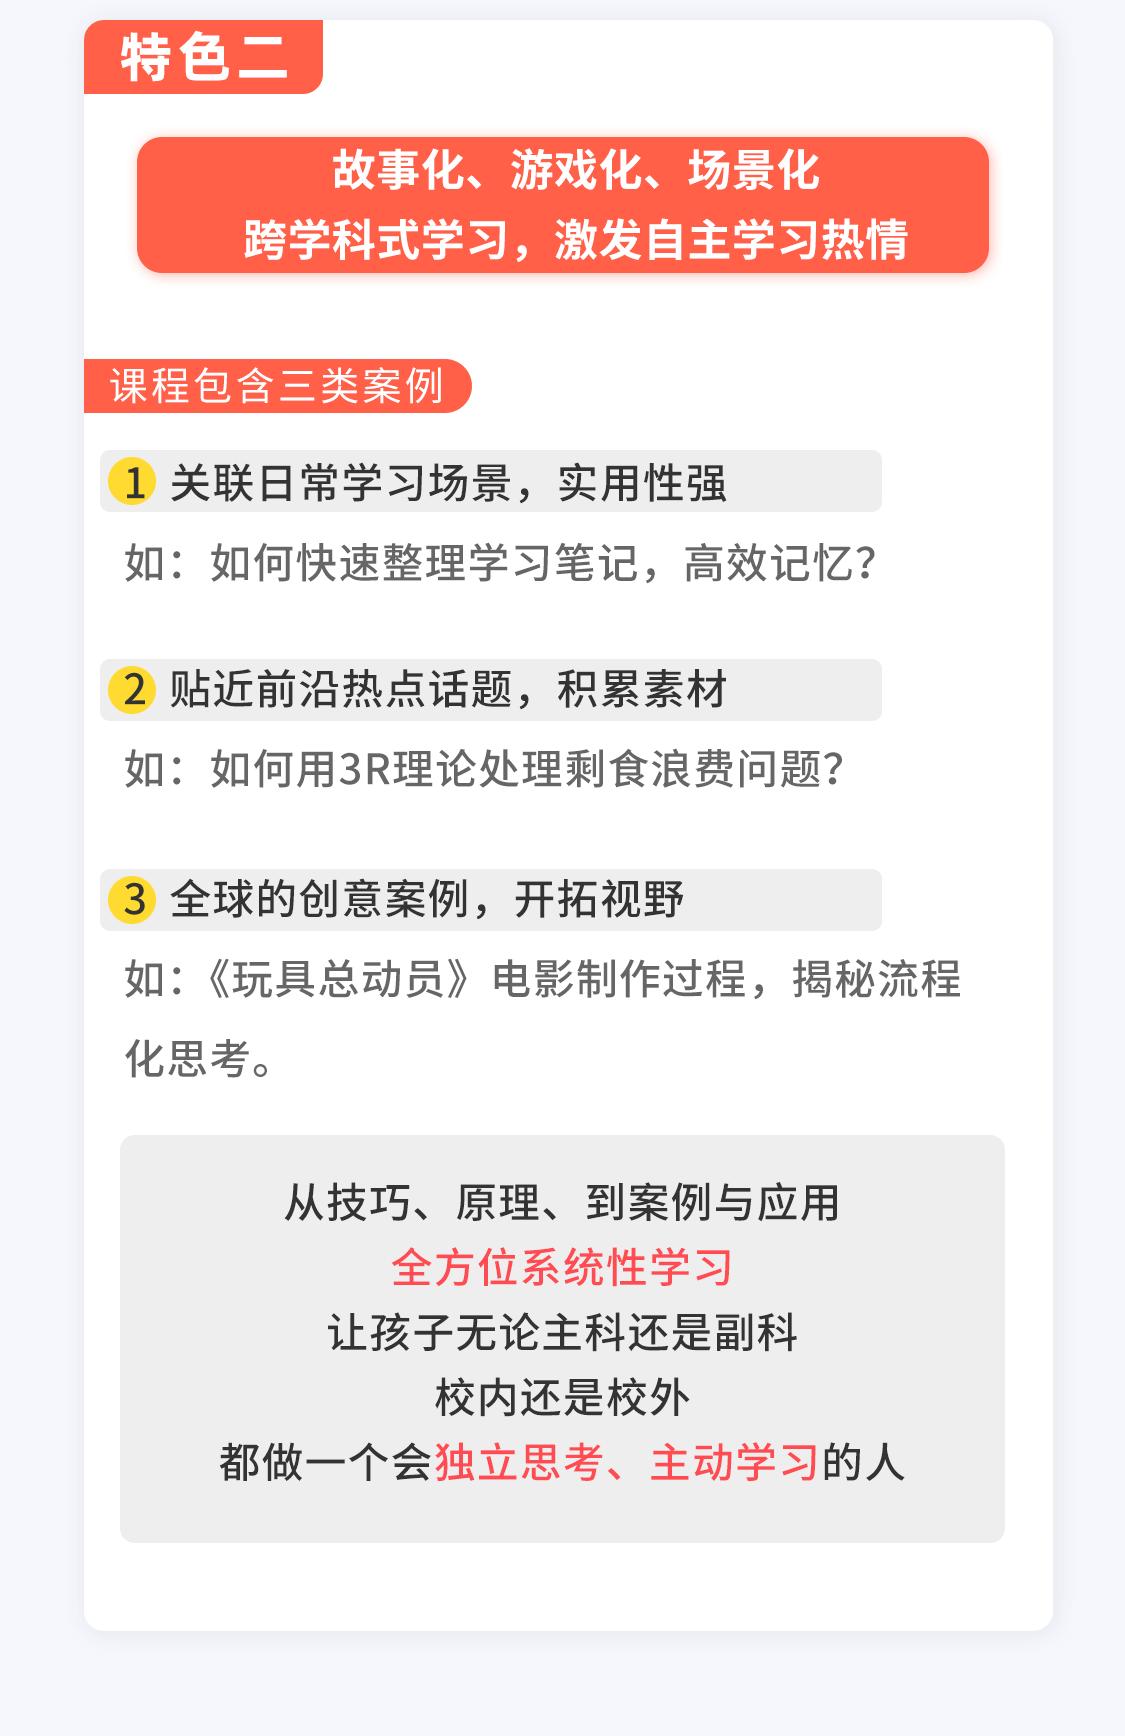 青少年思维导图2_02.png